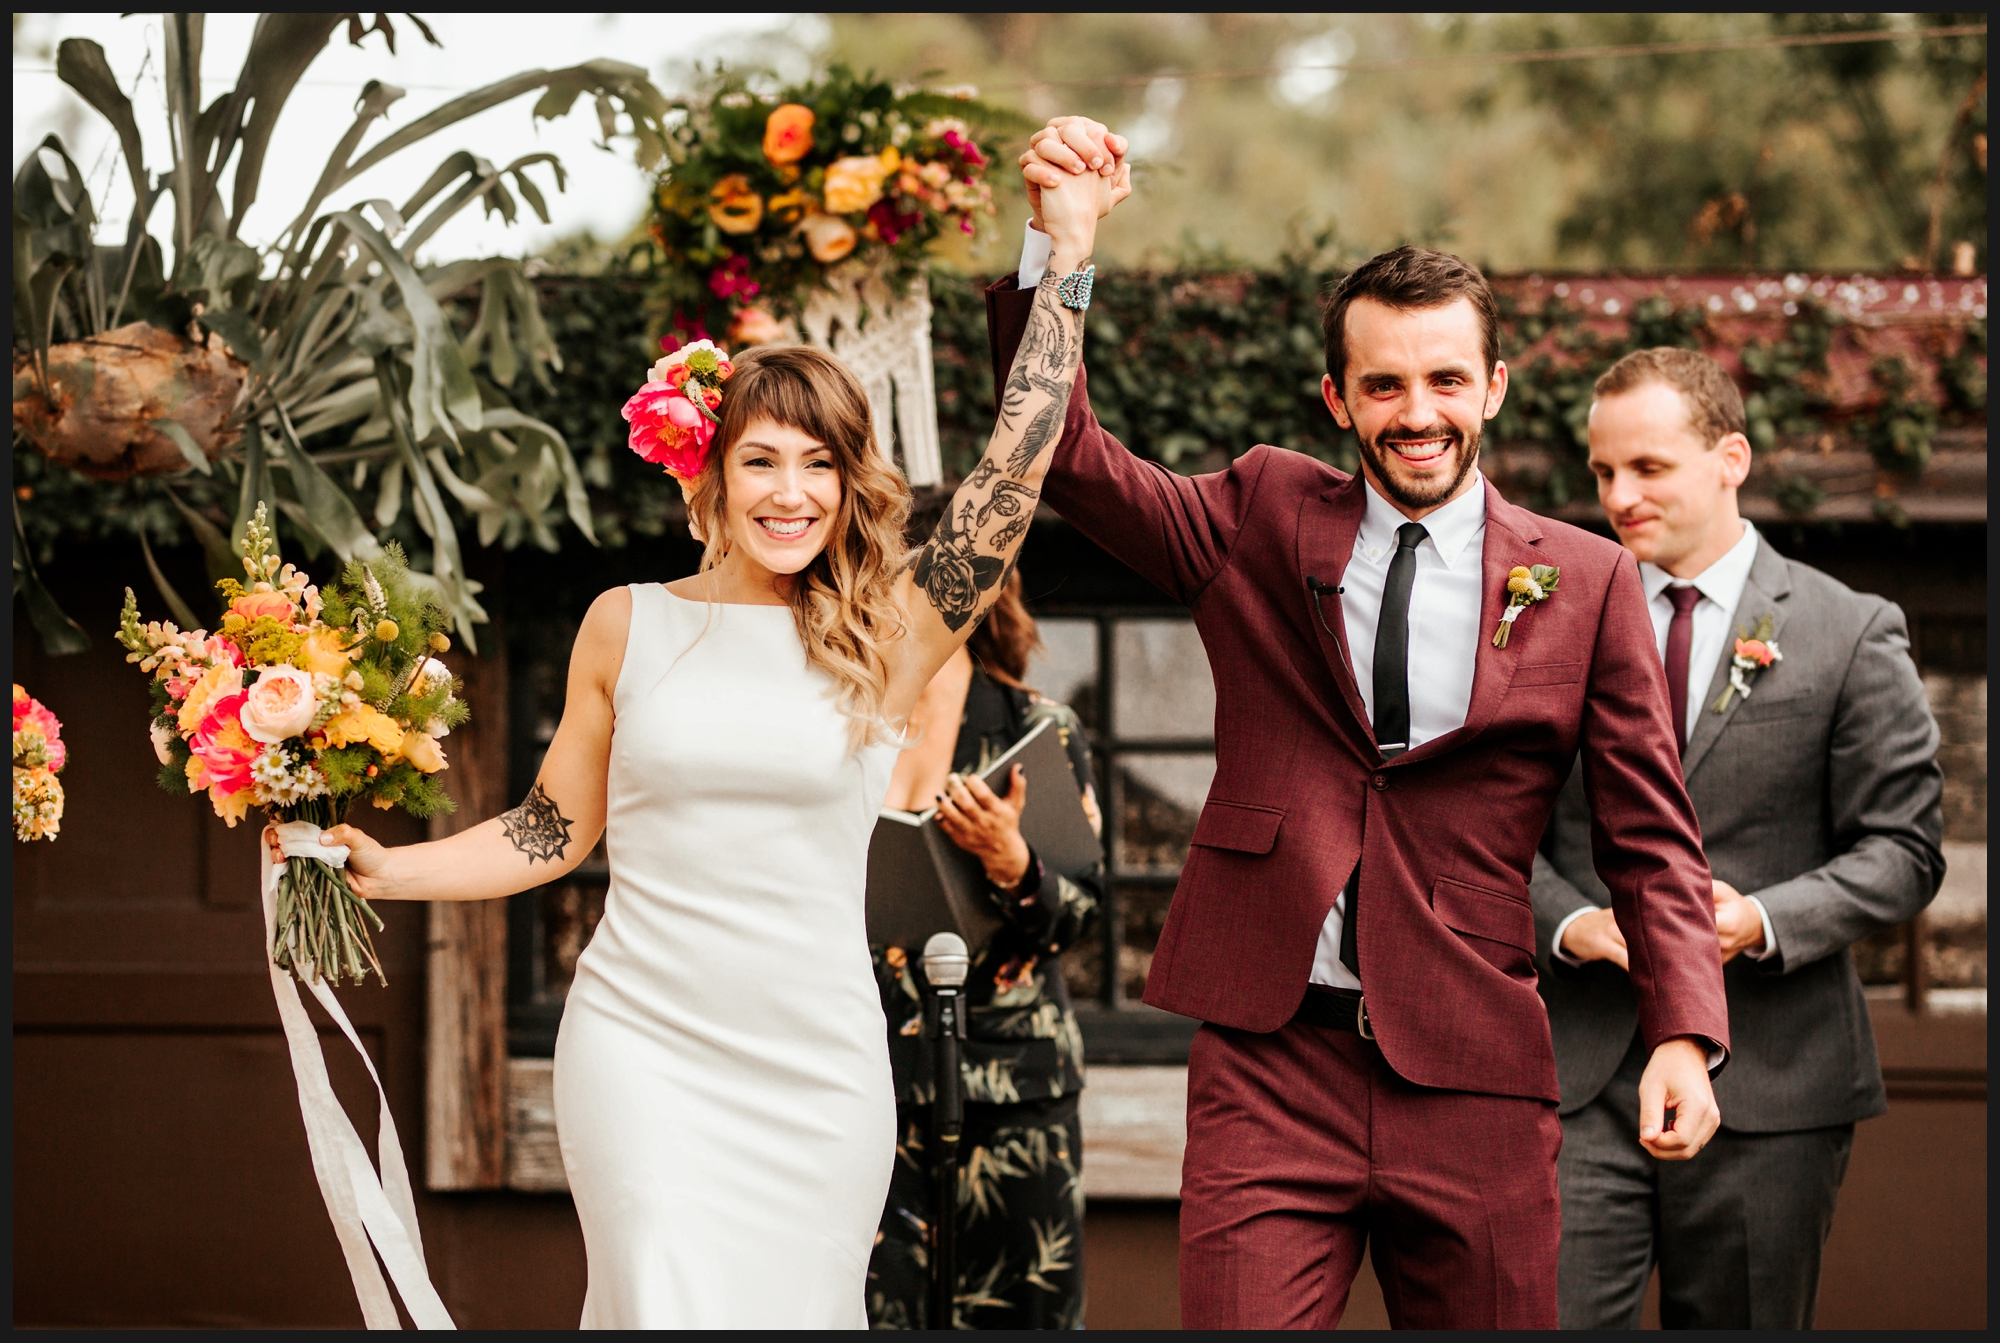 Orlando-Wedding-Photographer-destination-wedding-photographer-florida-wedding-photographer-bohemian-wedding-photographer_2011.jpg